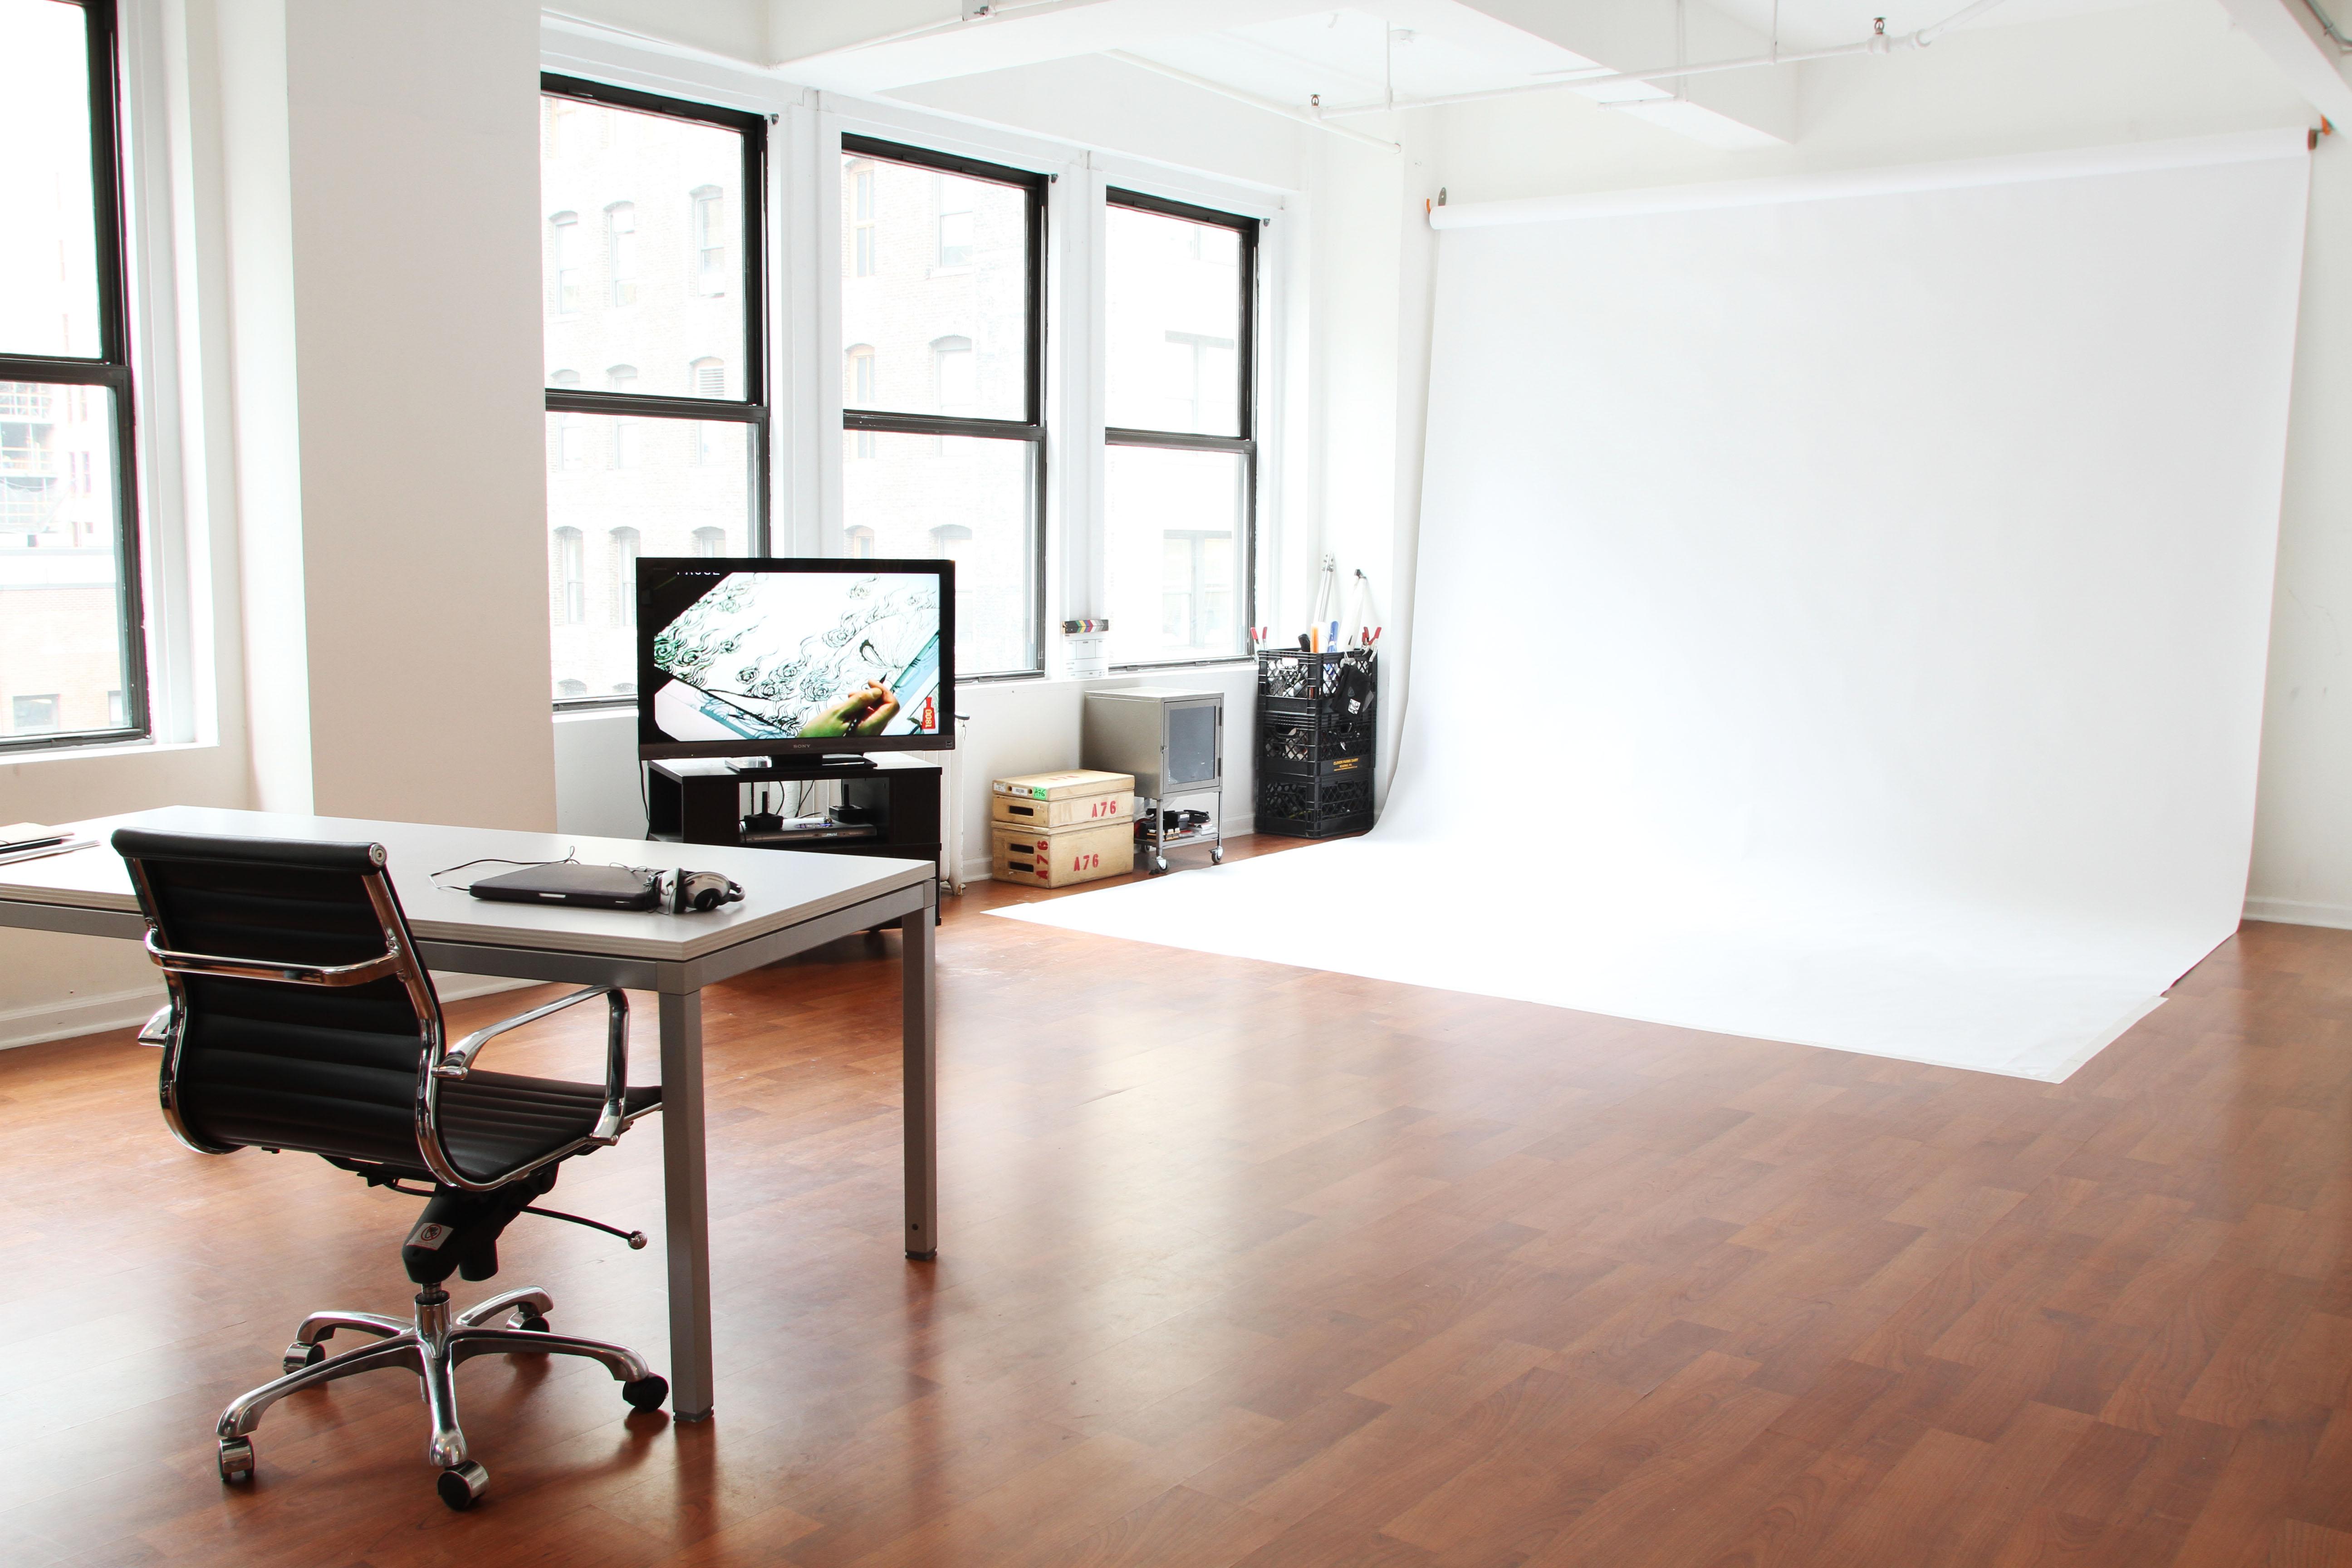 A76 Studio